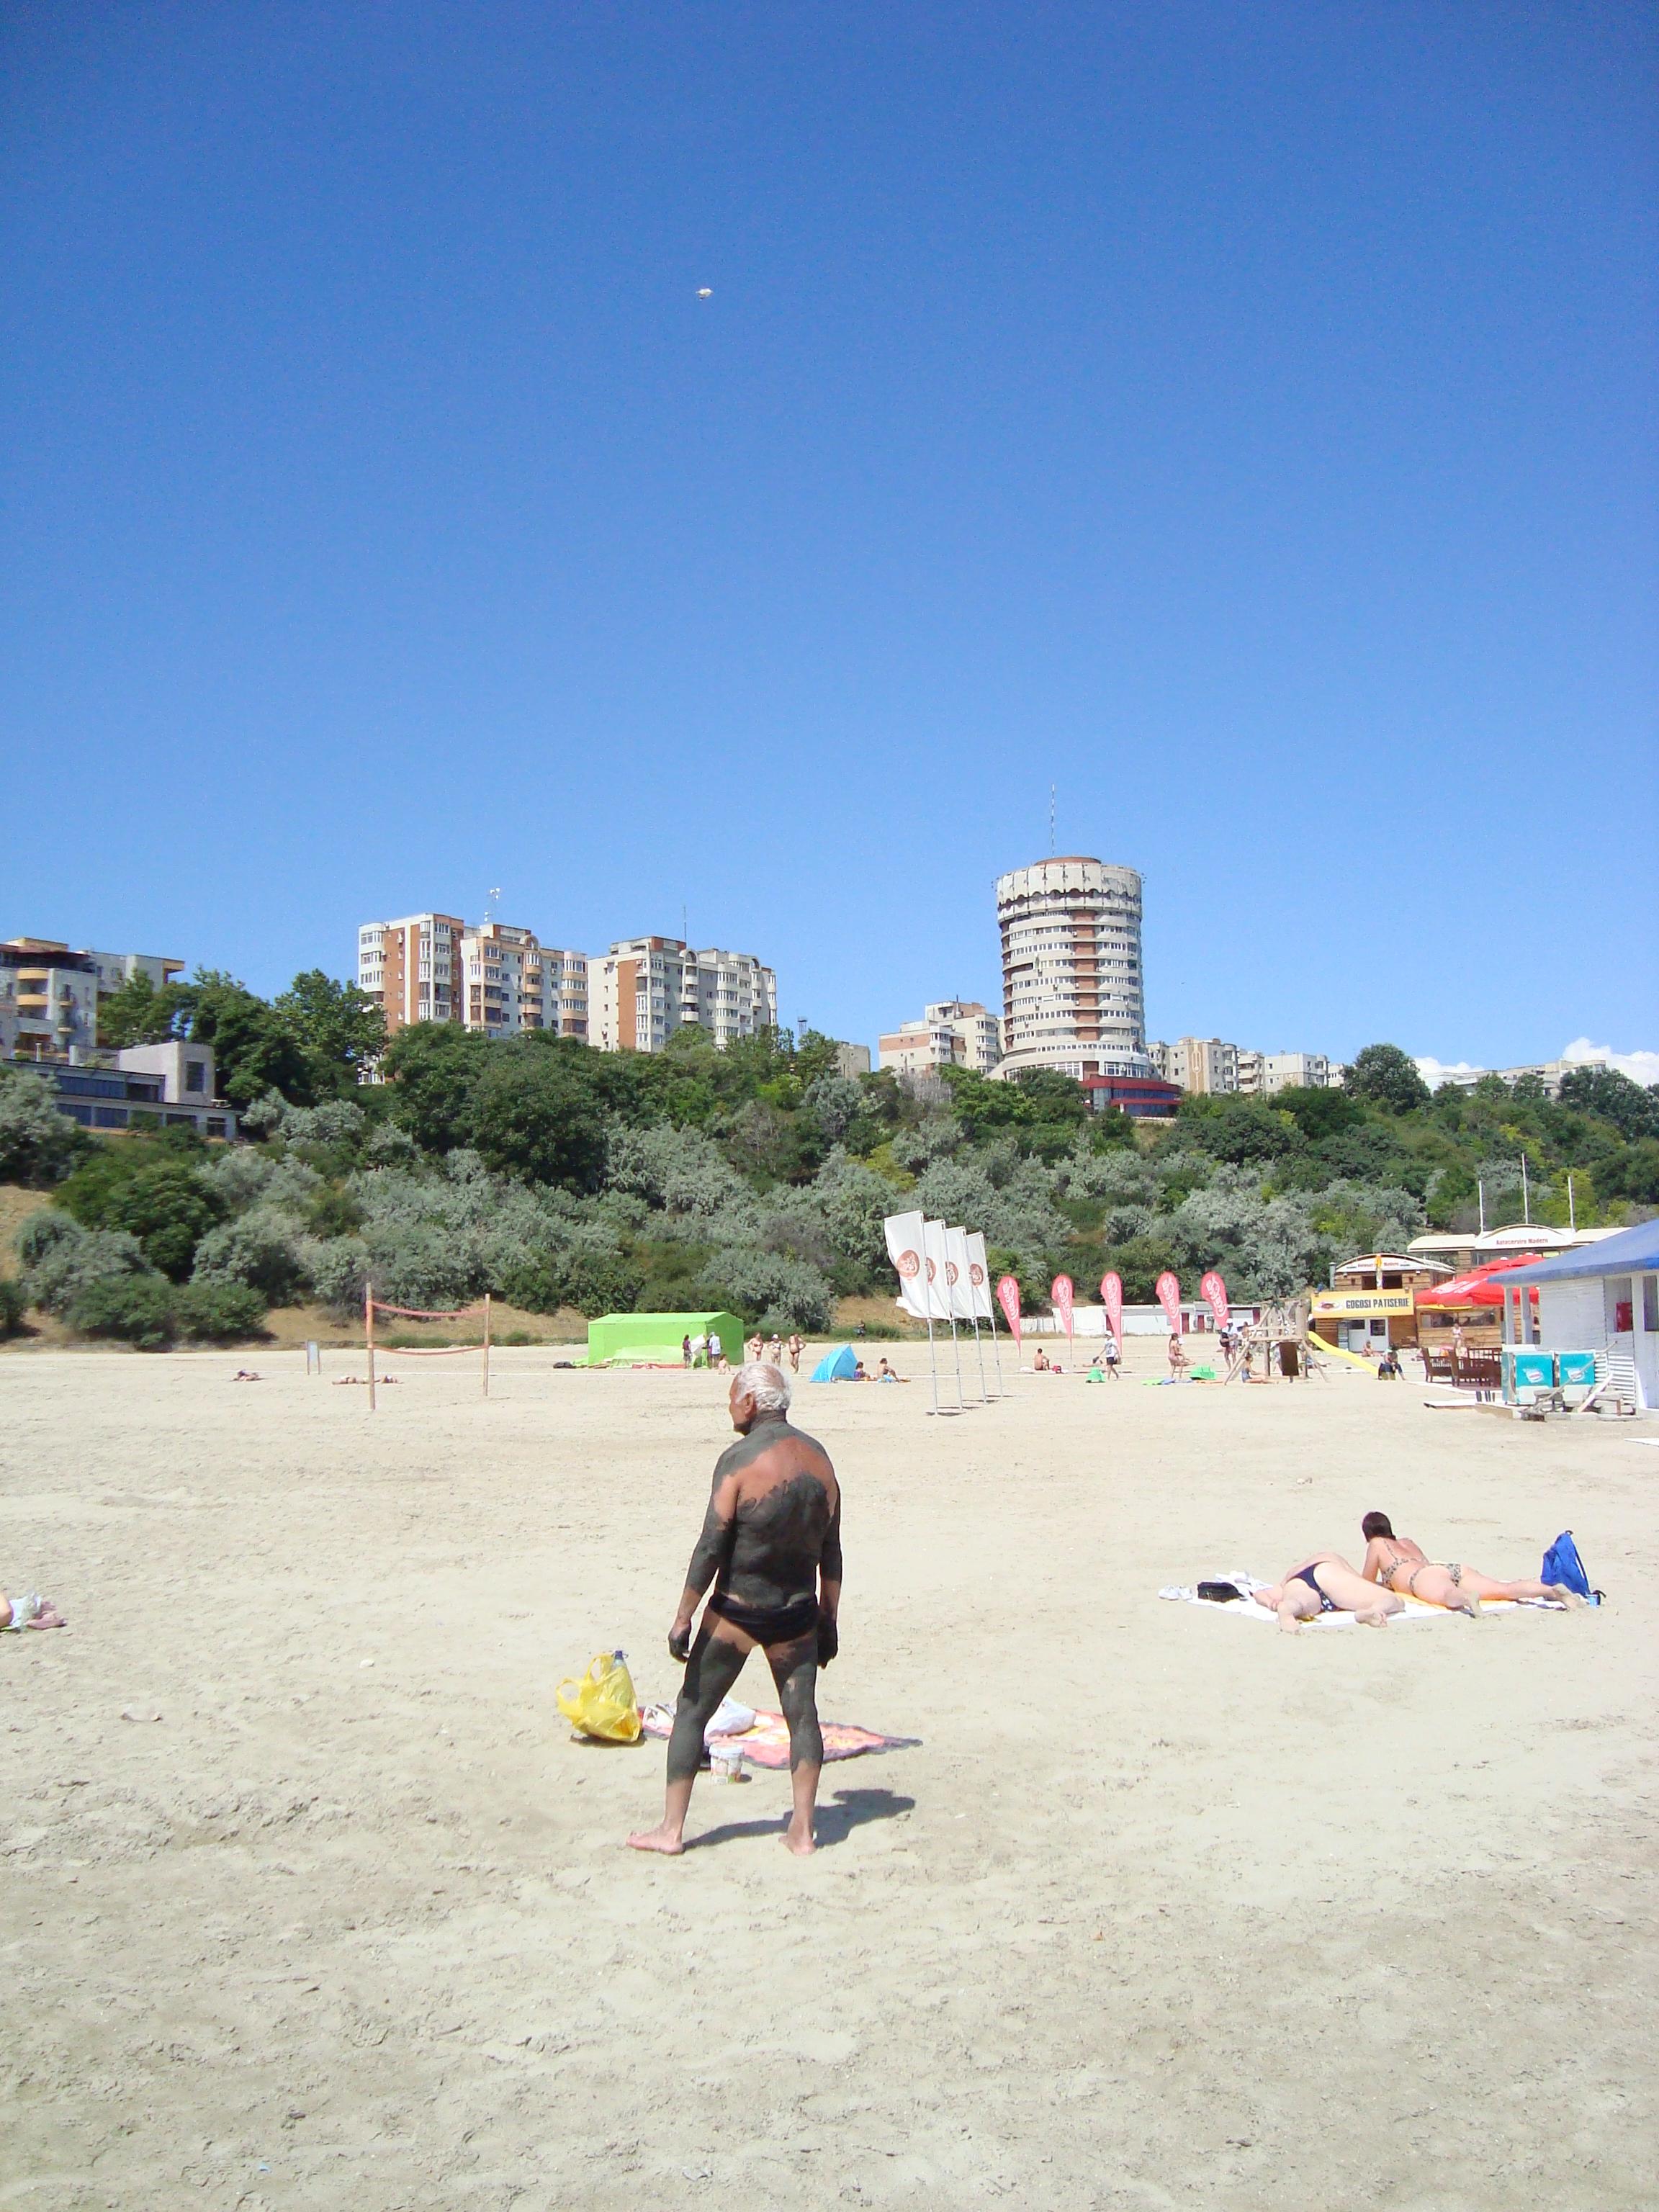 1 Pe plaja din Constanta, la fel ca altadata